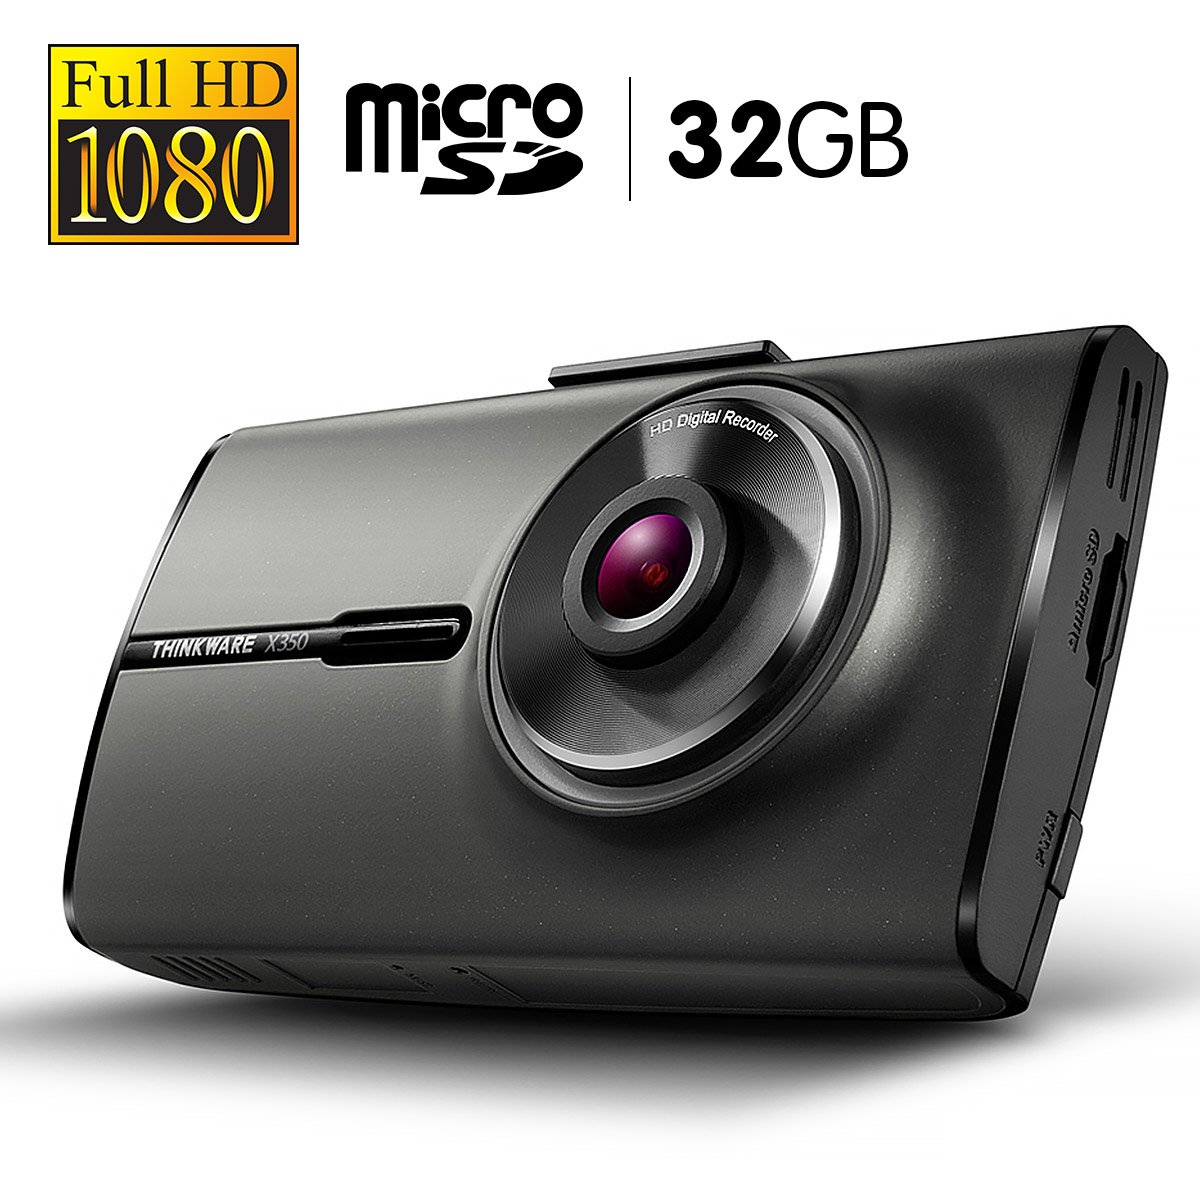 THINKWARE 1080P Full HD Dash Cam With 32GB Micro SD - X35032